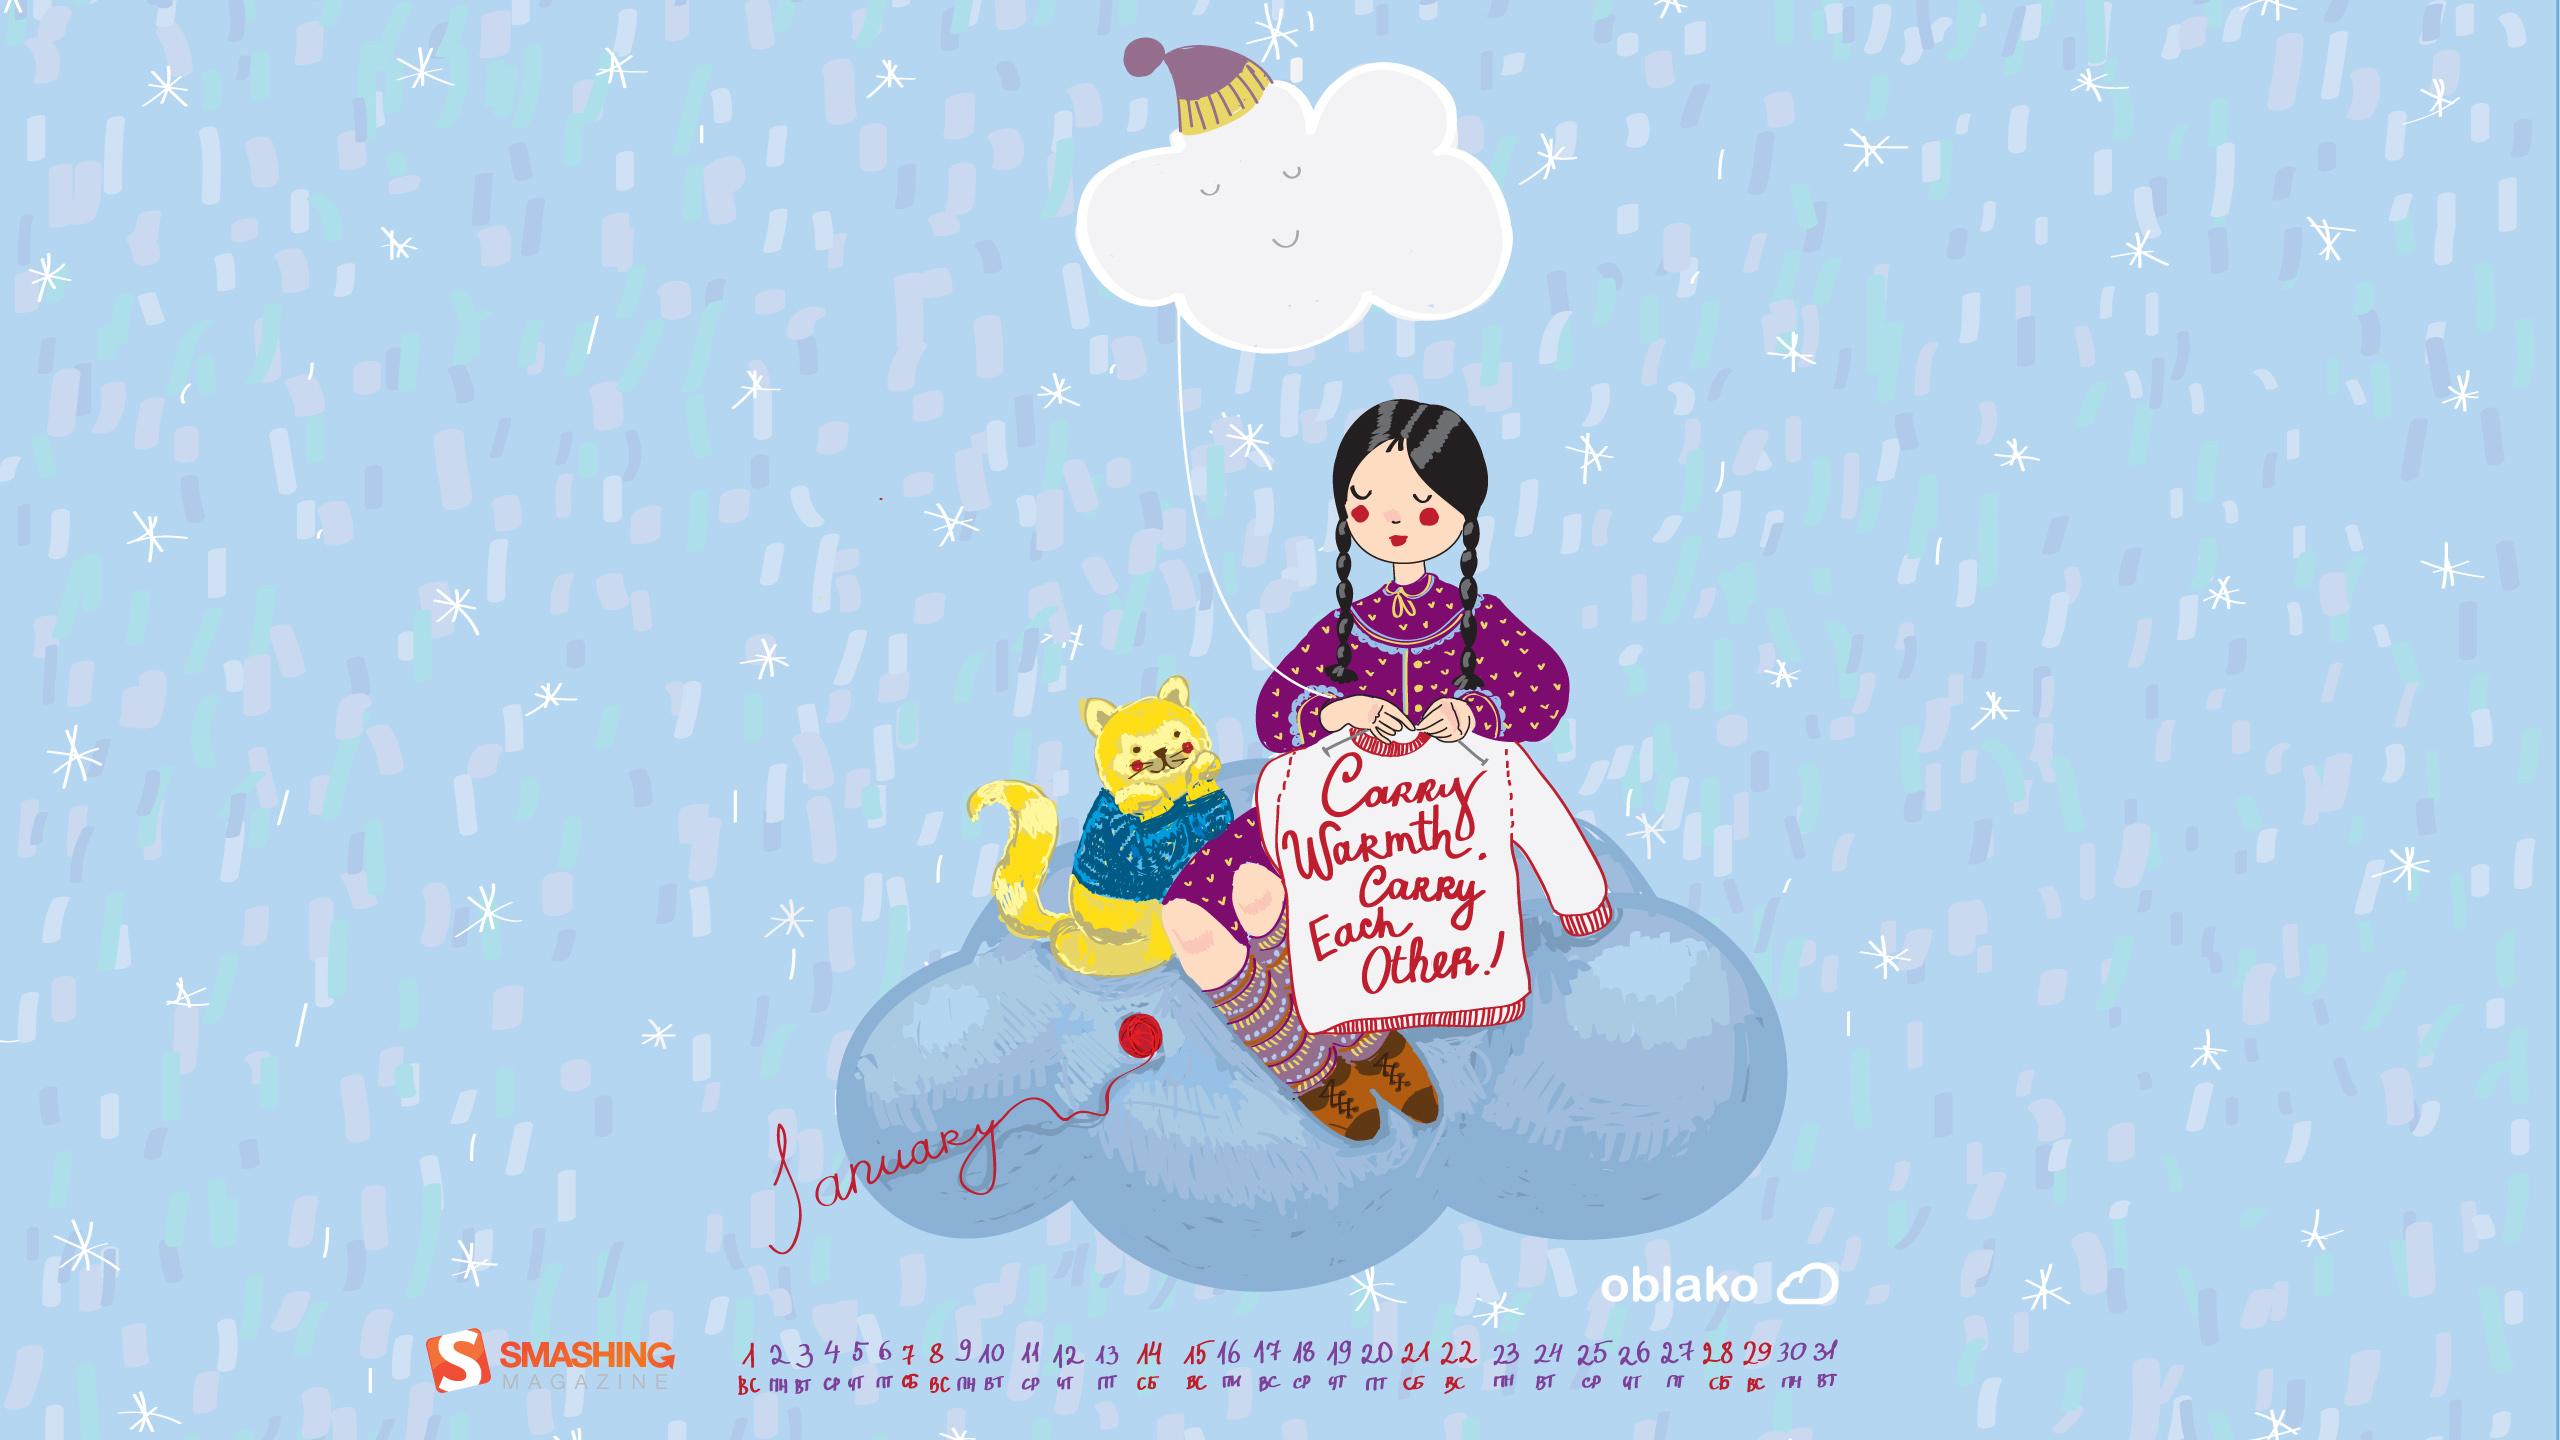 Зима обои c rfktylfhtv yf ltrf hm 2012 5